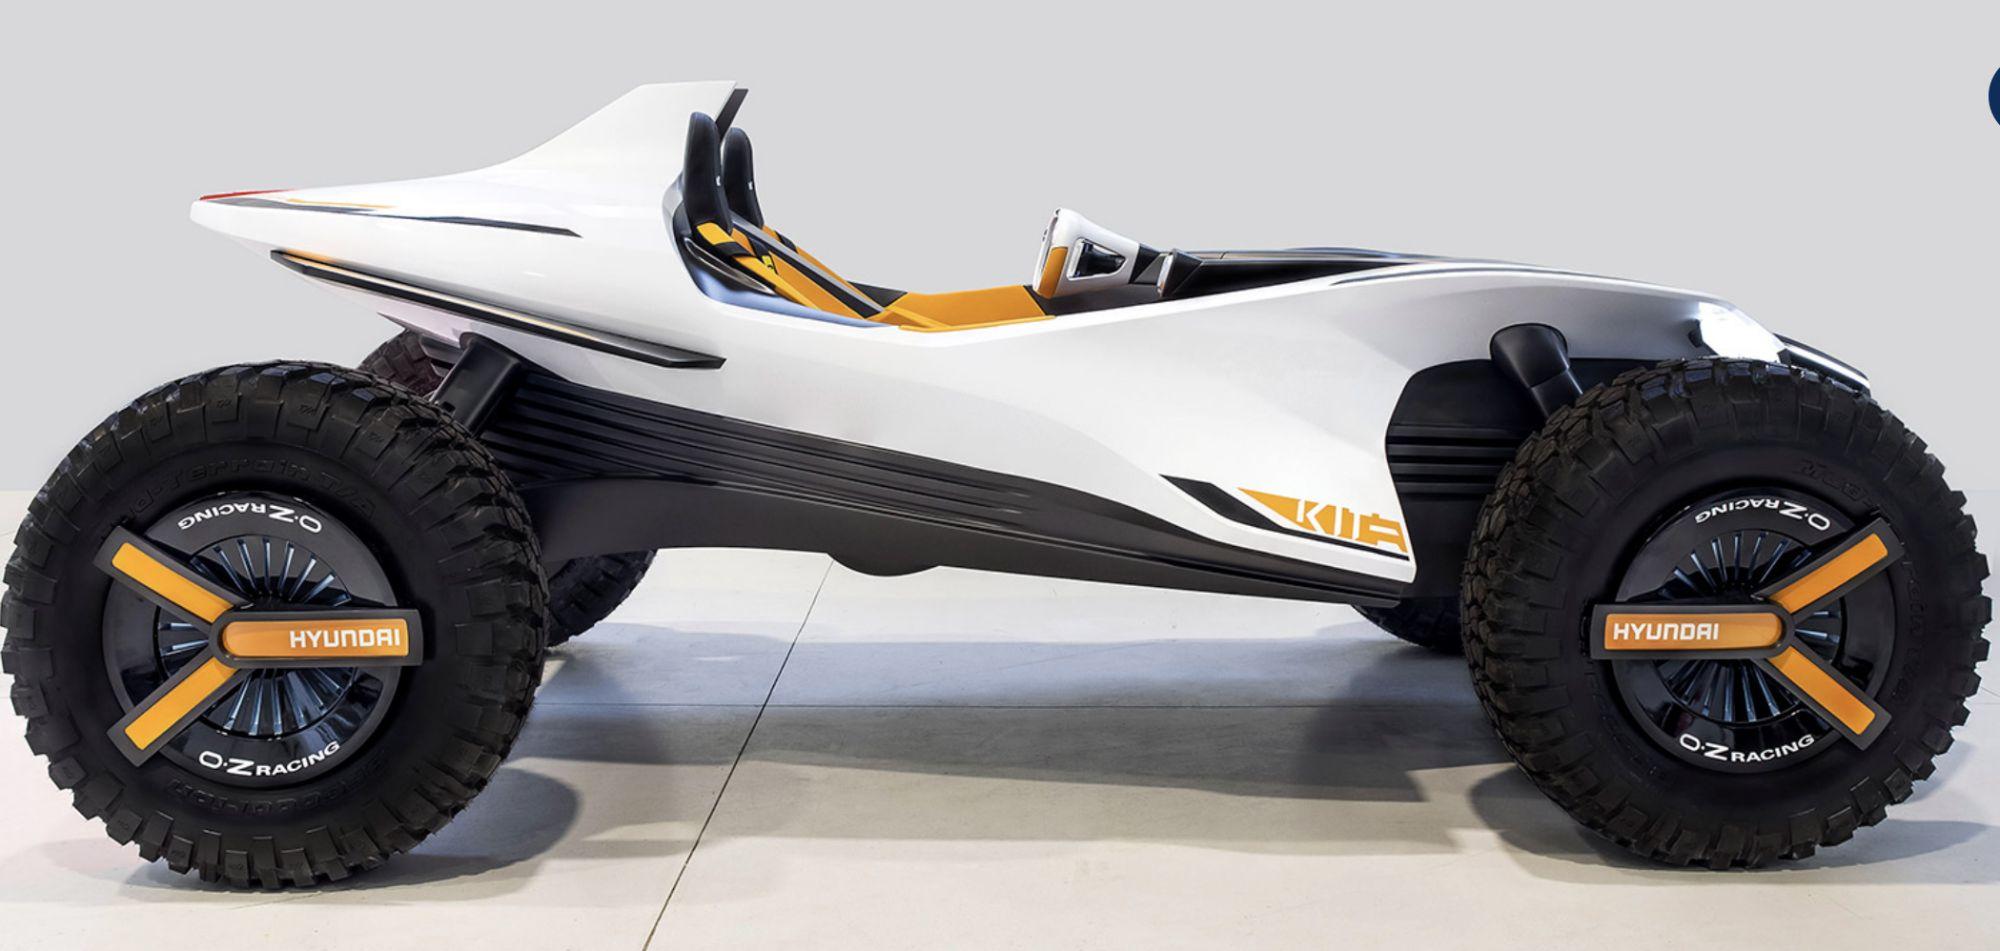 10-Hyundai-Jet-ski-dune-buggy